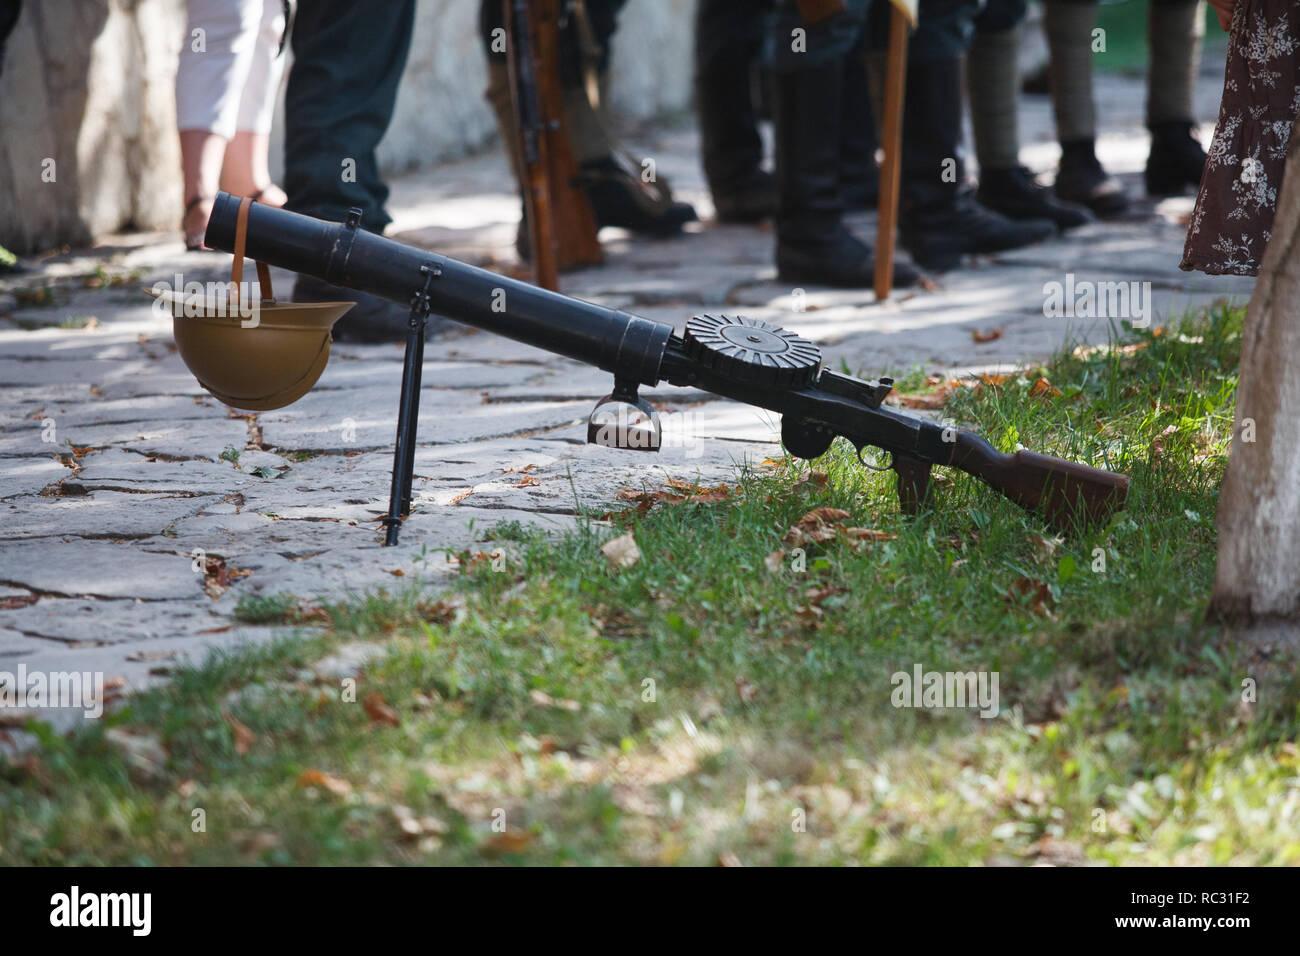 First World War-era Lewis automatic light machine gun - Stock Image